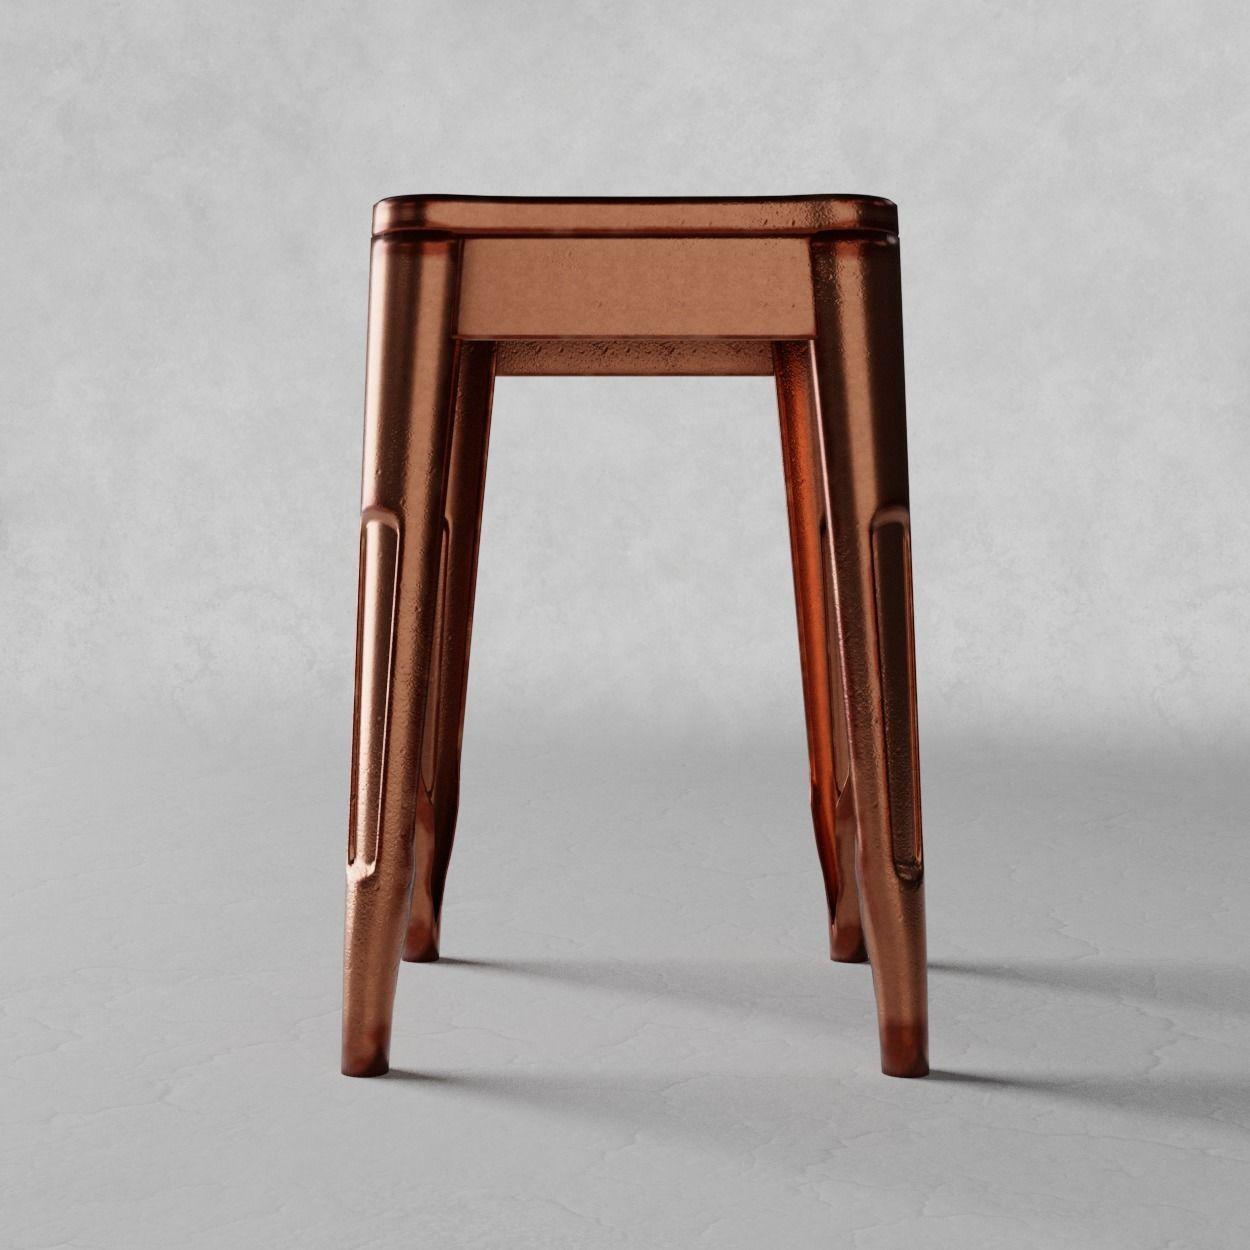 Swell Stool Metal Bronze 3D Model Machost Co Dining Chair Design Ideas Machostcouk